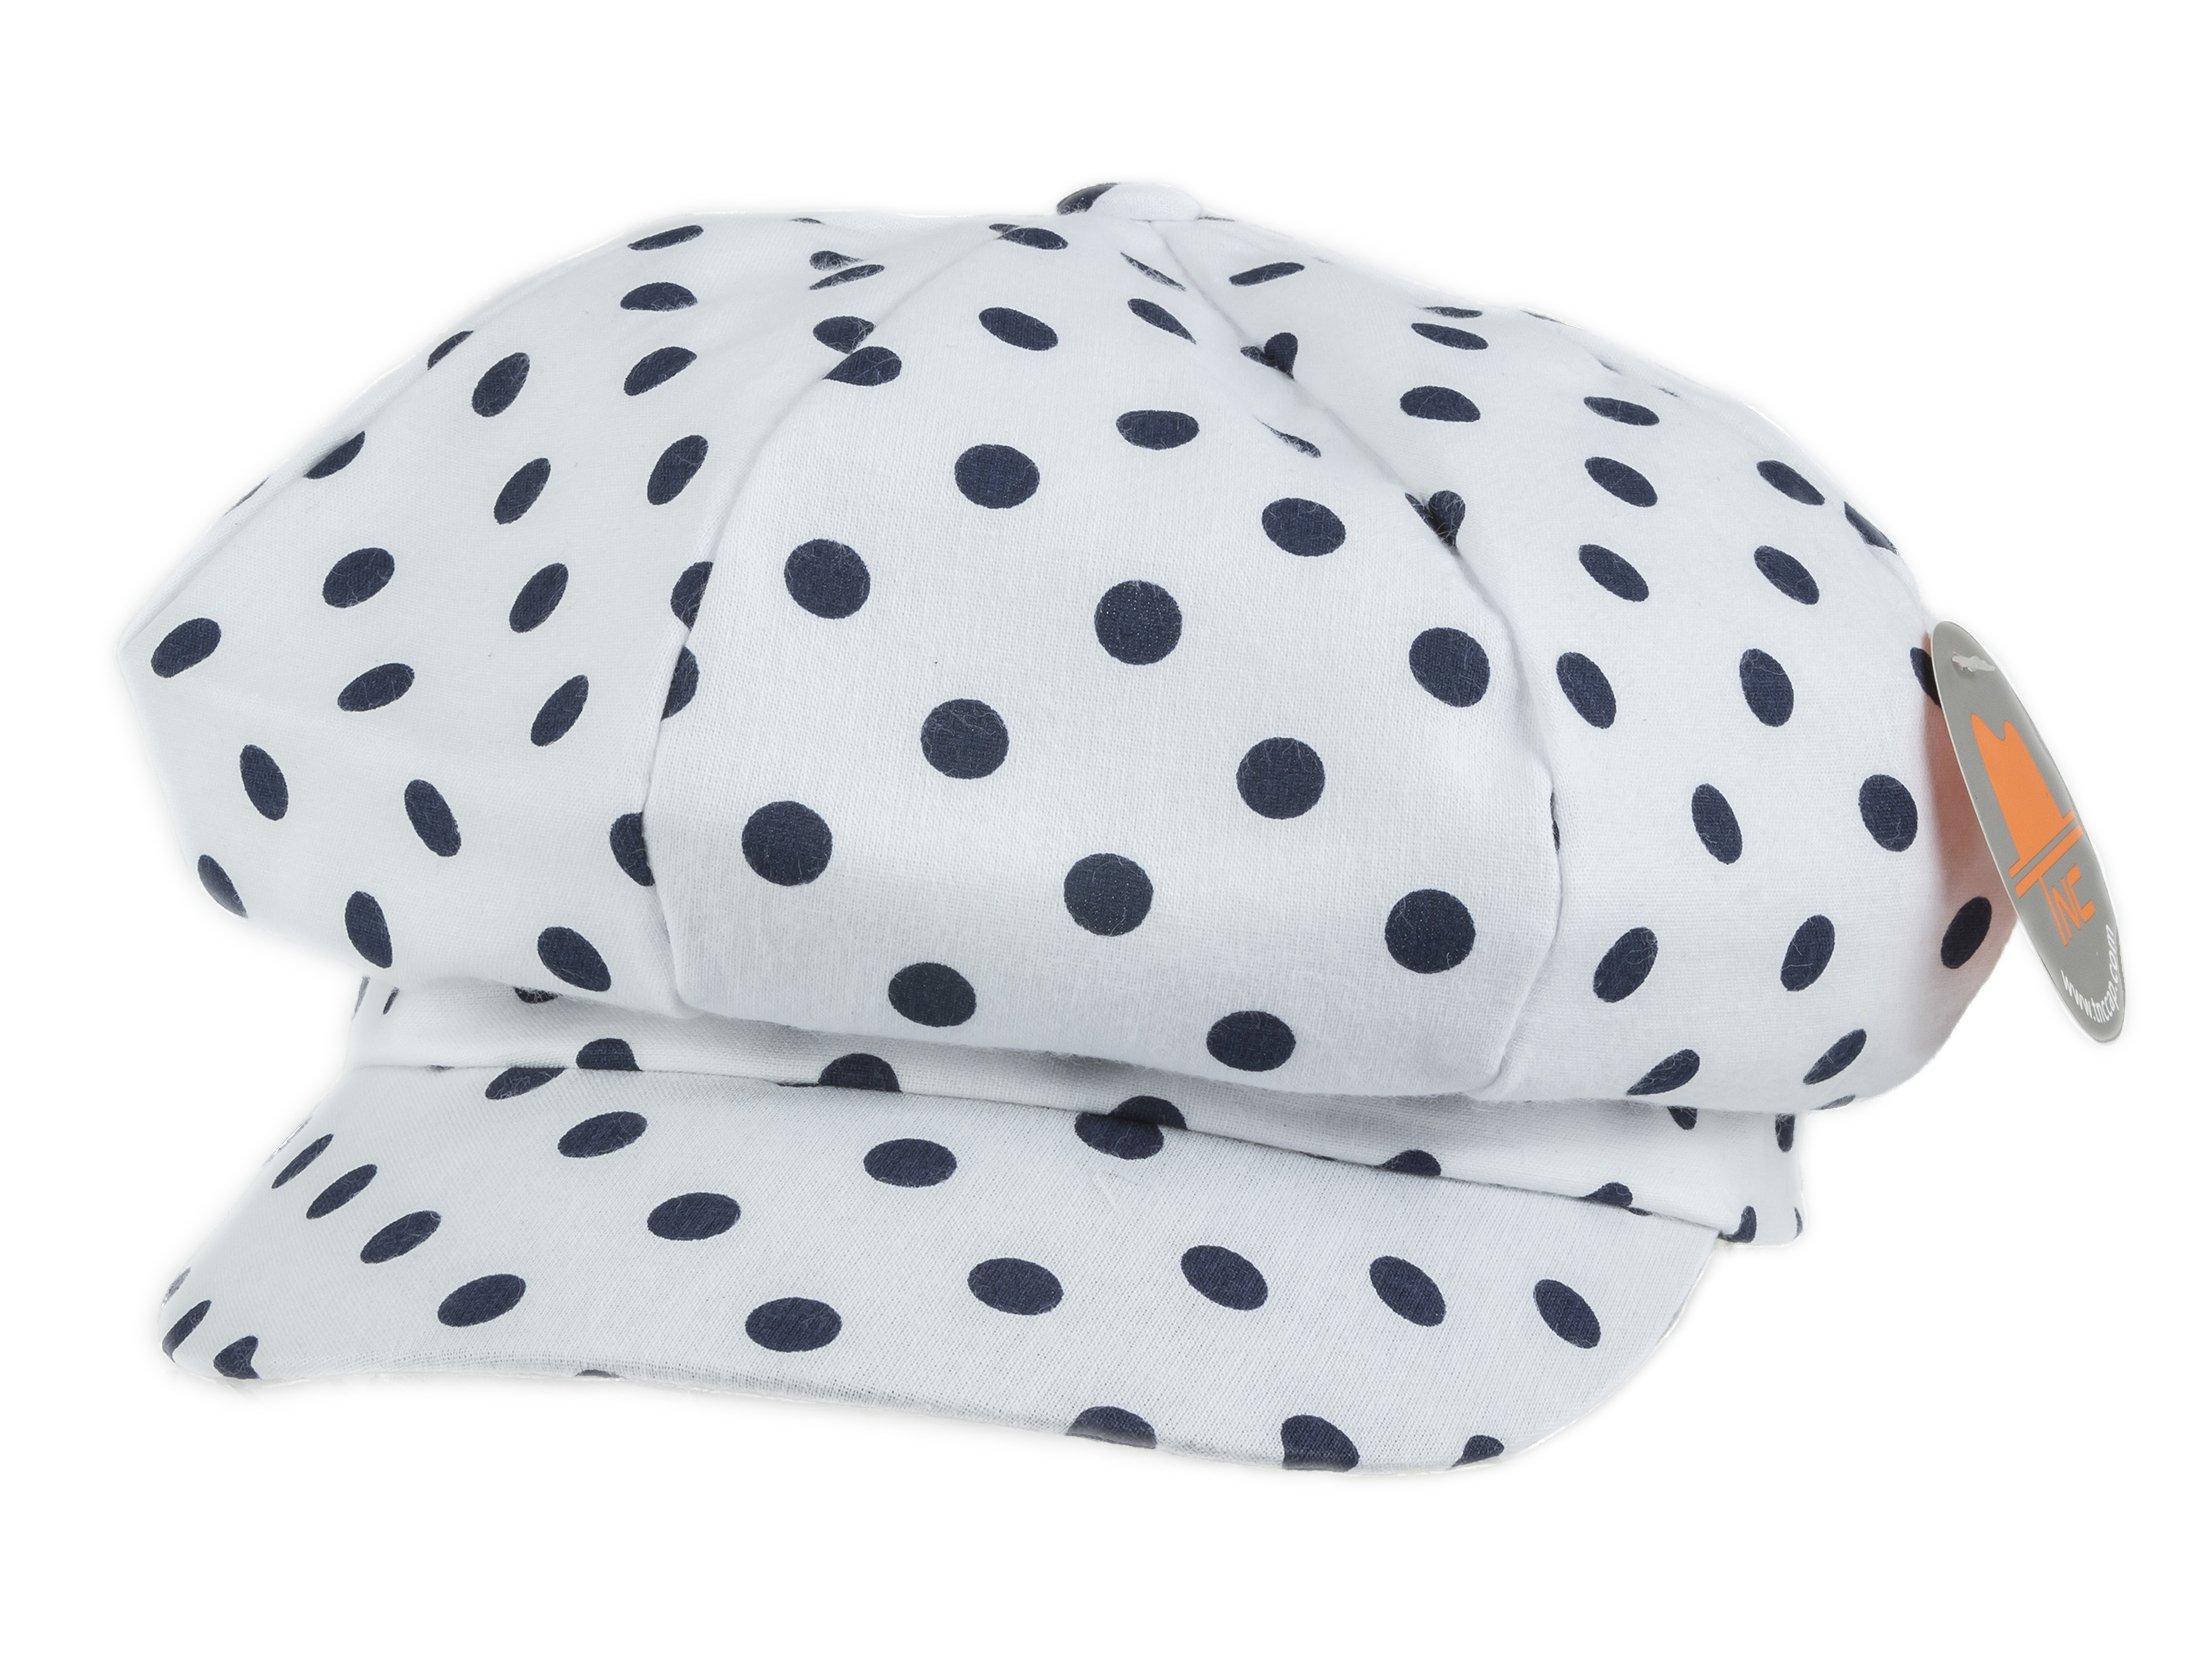 257a2b45cfd TNC newsboy Gatsby IVY Cap Golf Cabbie Driving Hat With Dot Print White